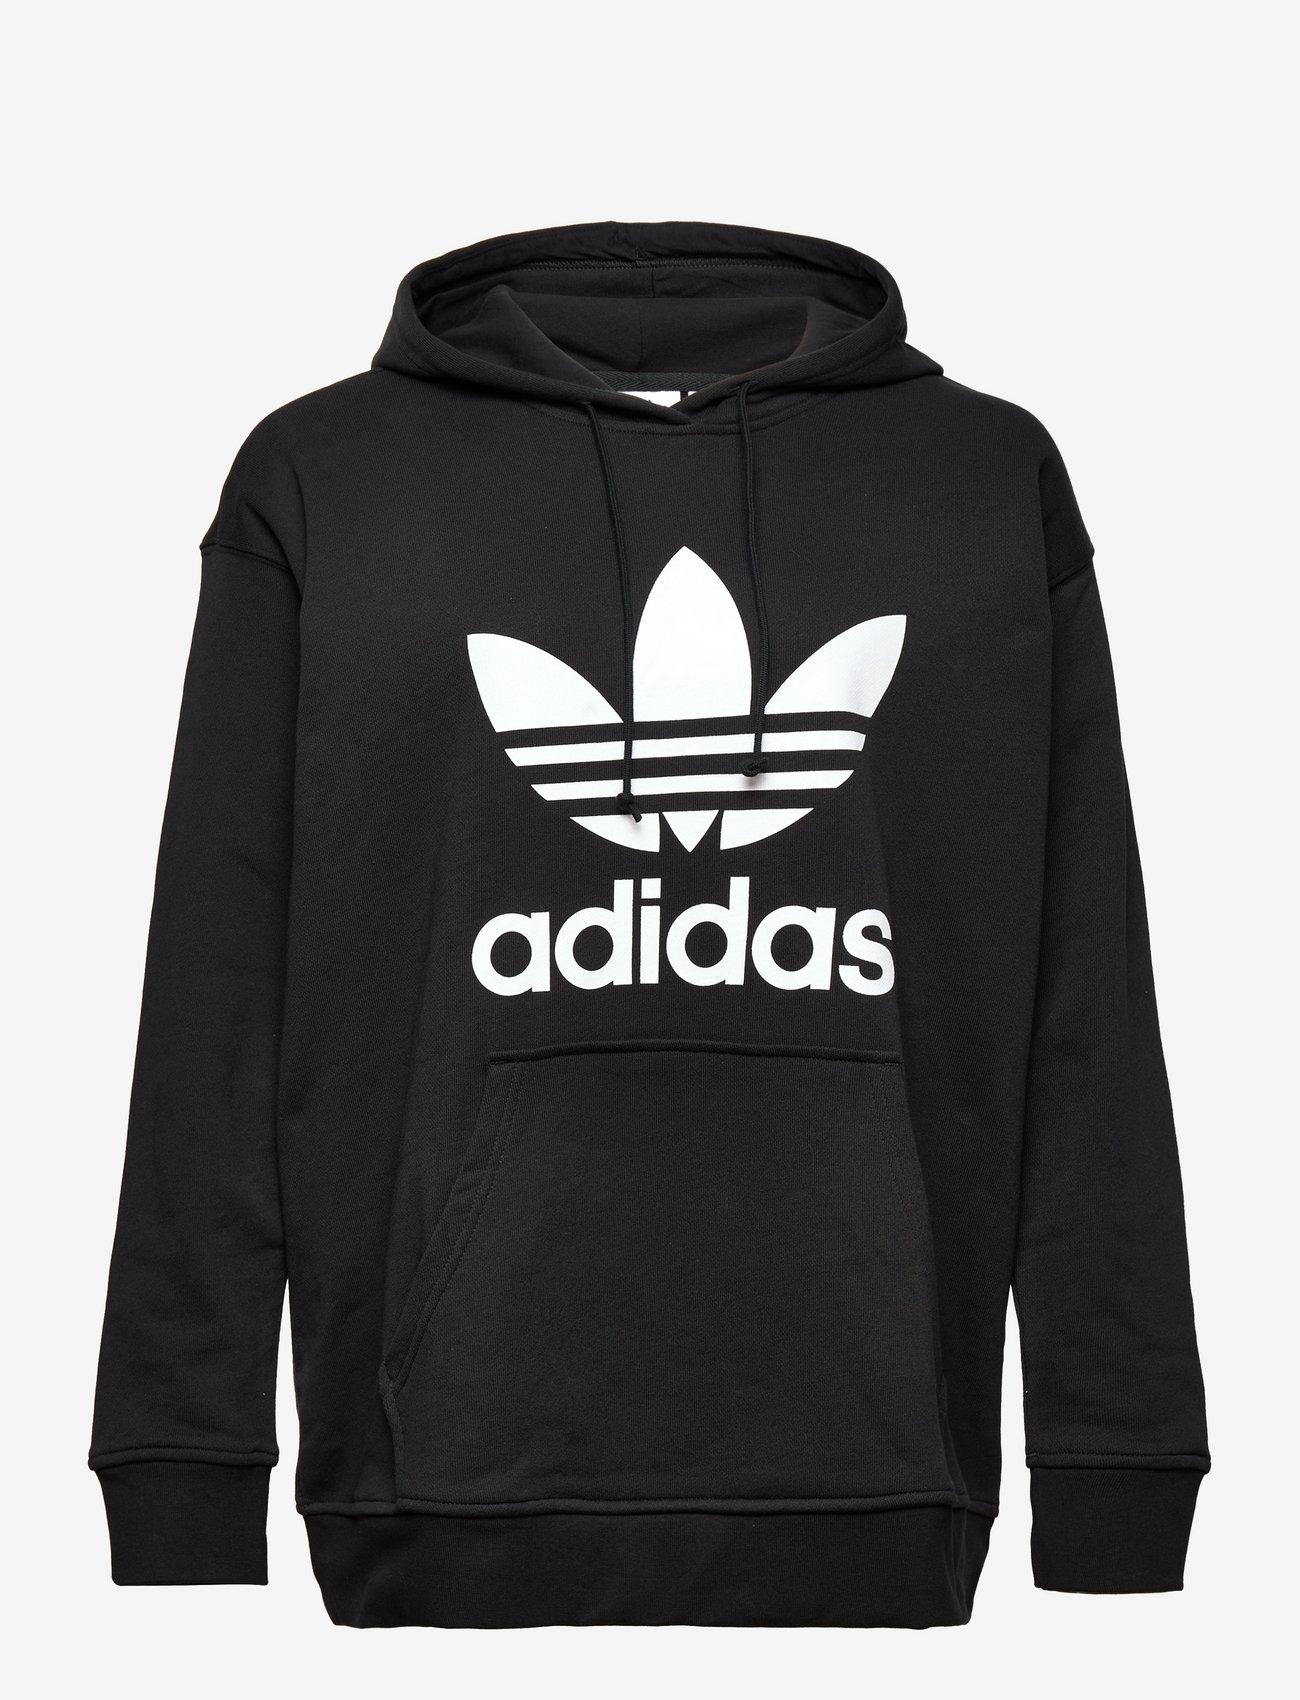 adidas Originals - TRF HOODIE - hupparit - black/white - 1